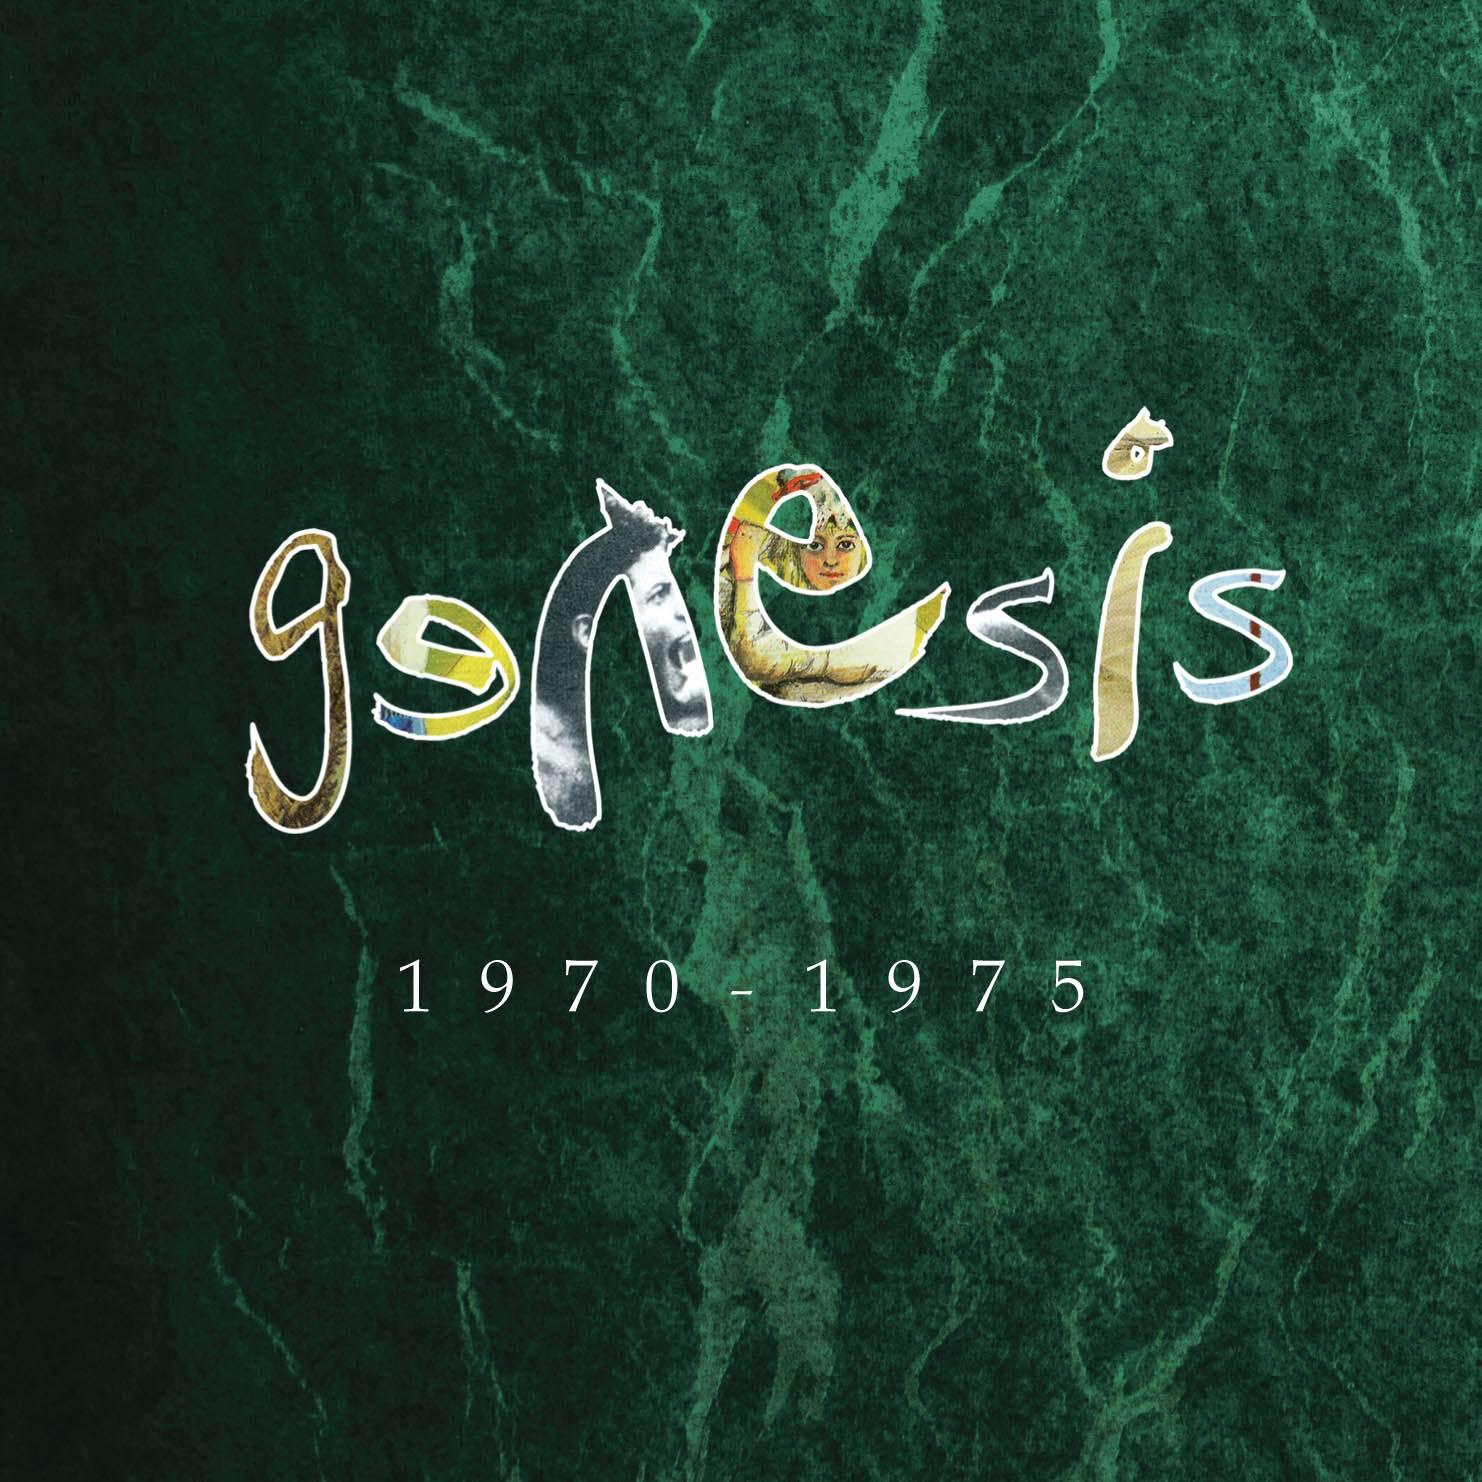 Phil Collins Gt Discographie Gt Genesis